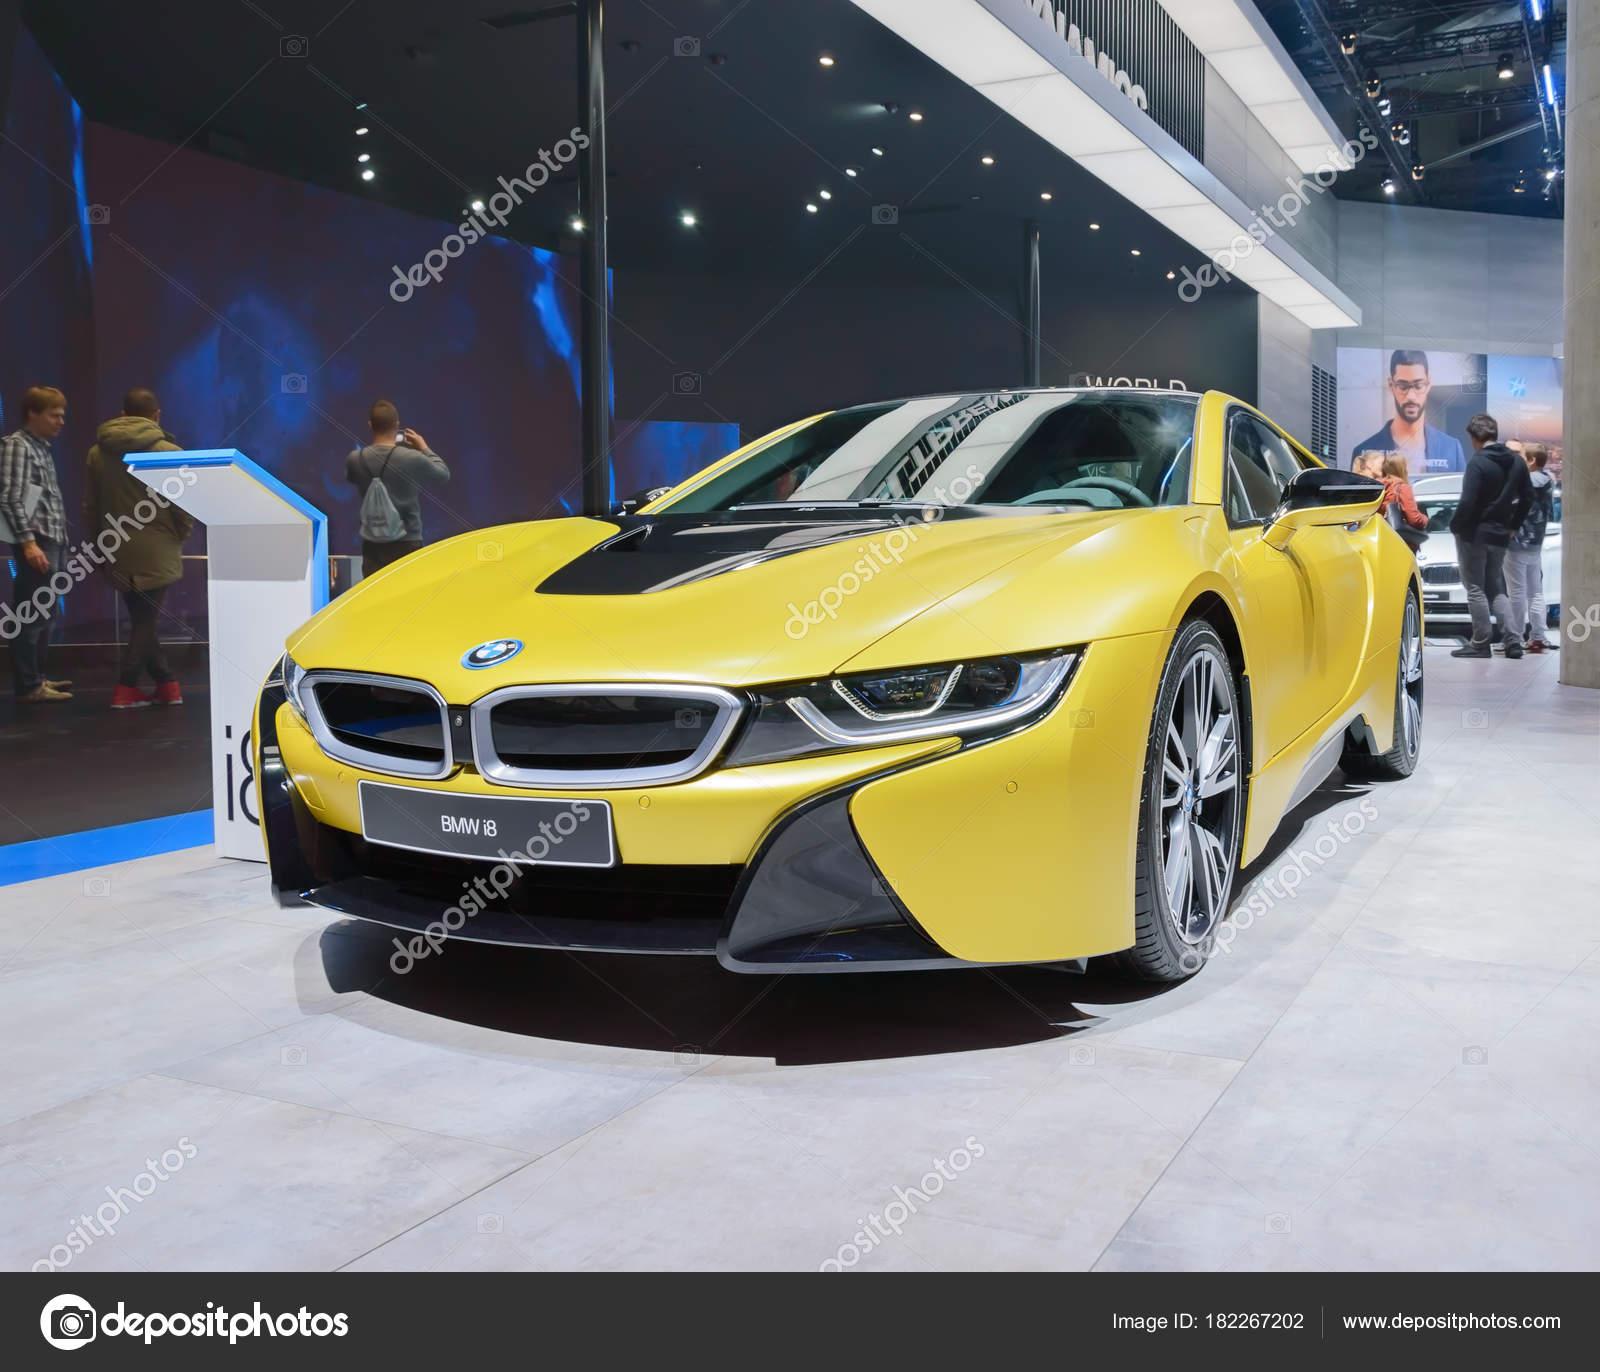 Bmw I8 Plug In Hybrid Electric Car At Iaa 2017 Stock Editorial